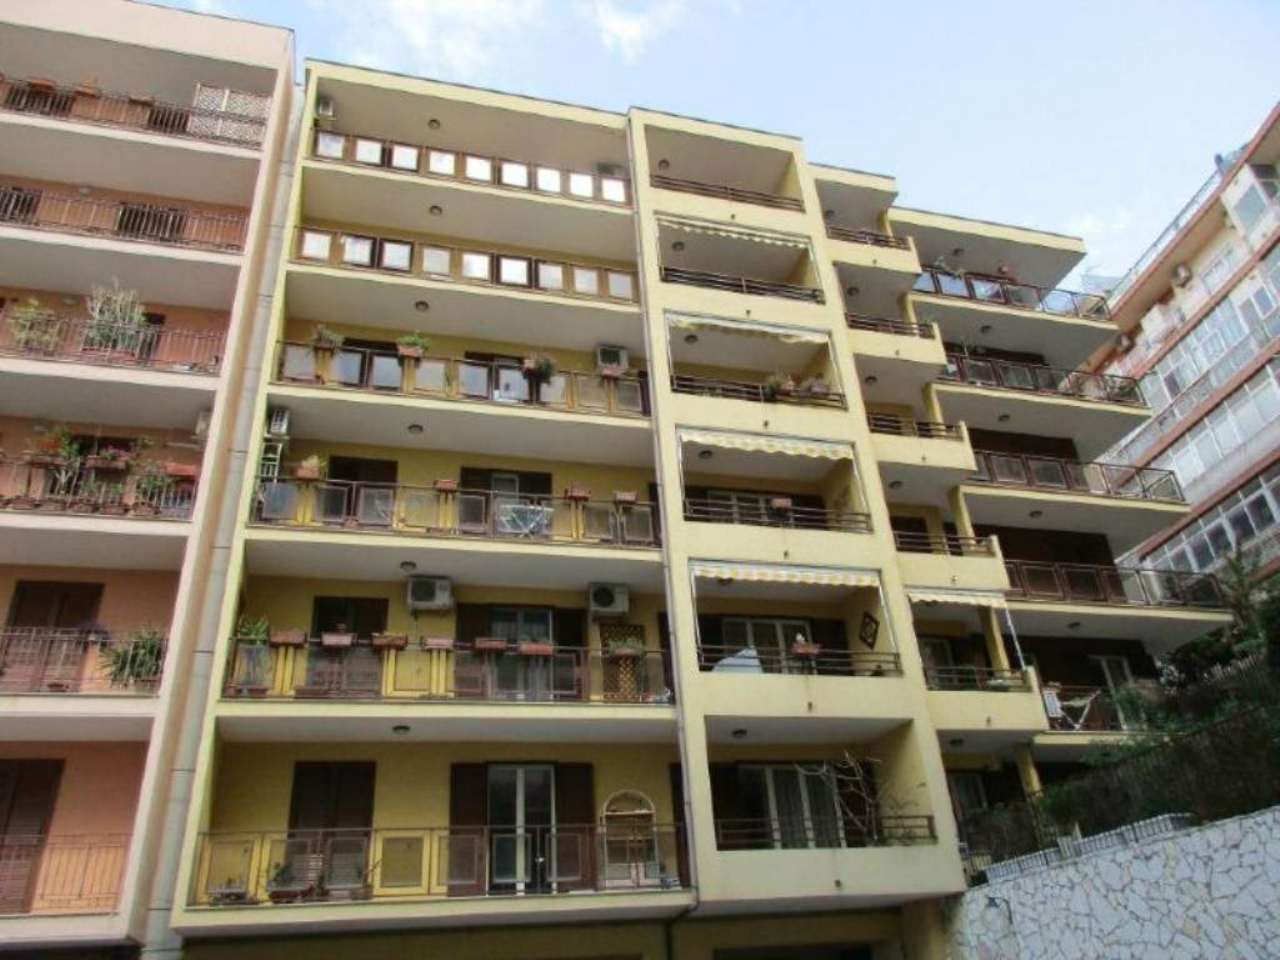 Bilocale Messina Via Umberto Giordano 2